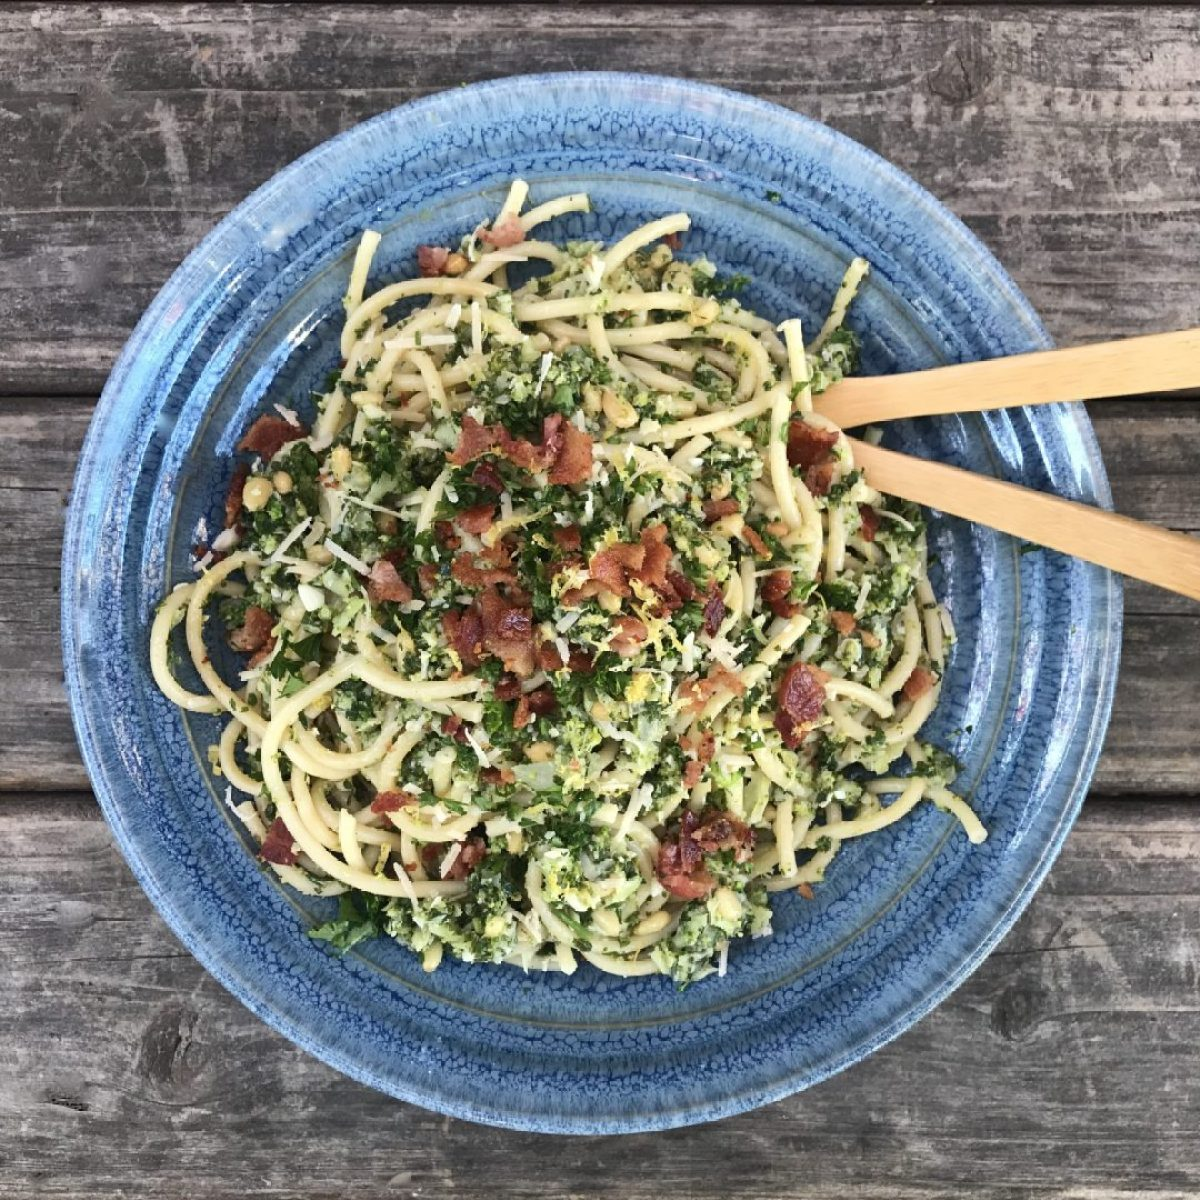 bucatini pasta with shredded broccoli